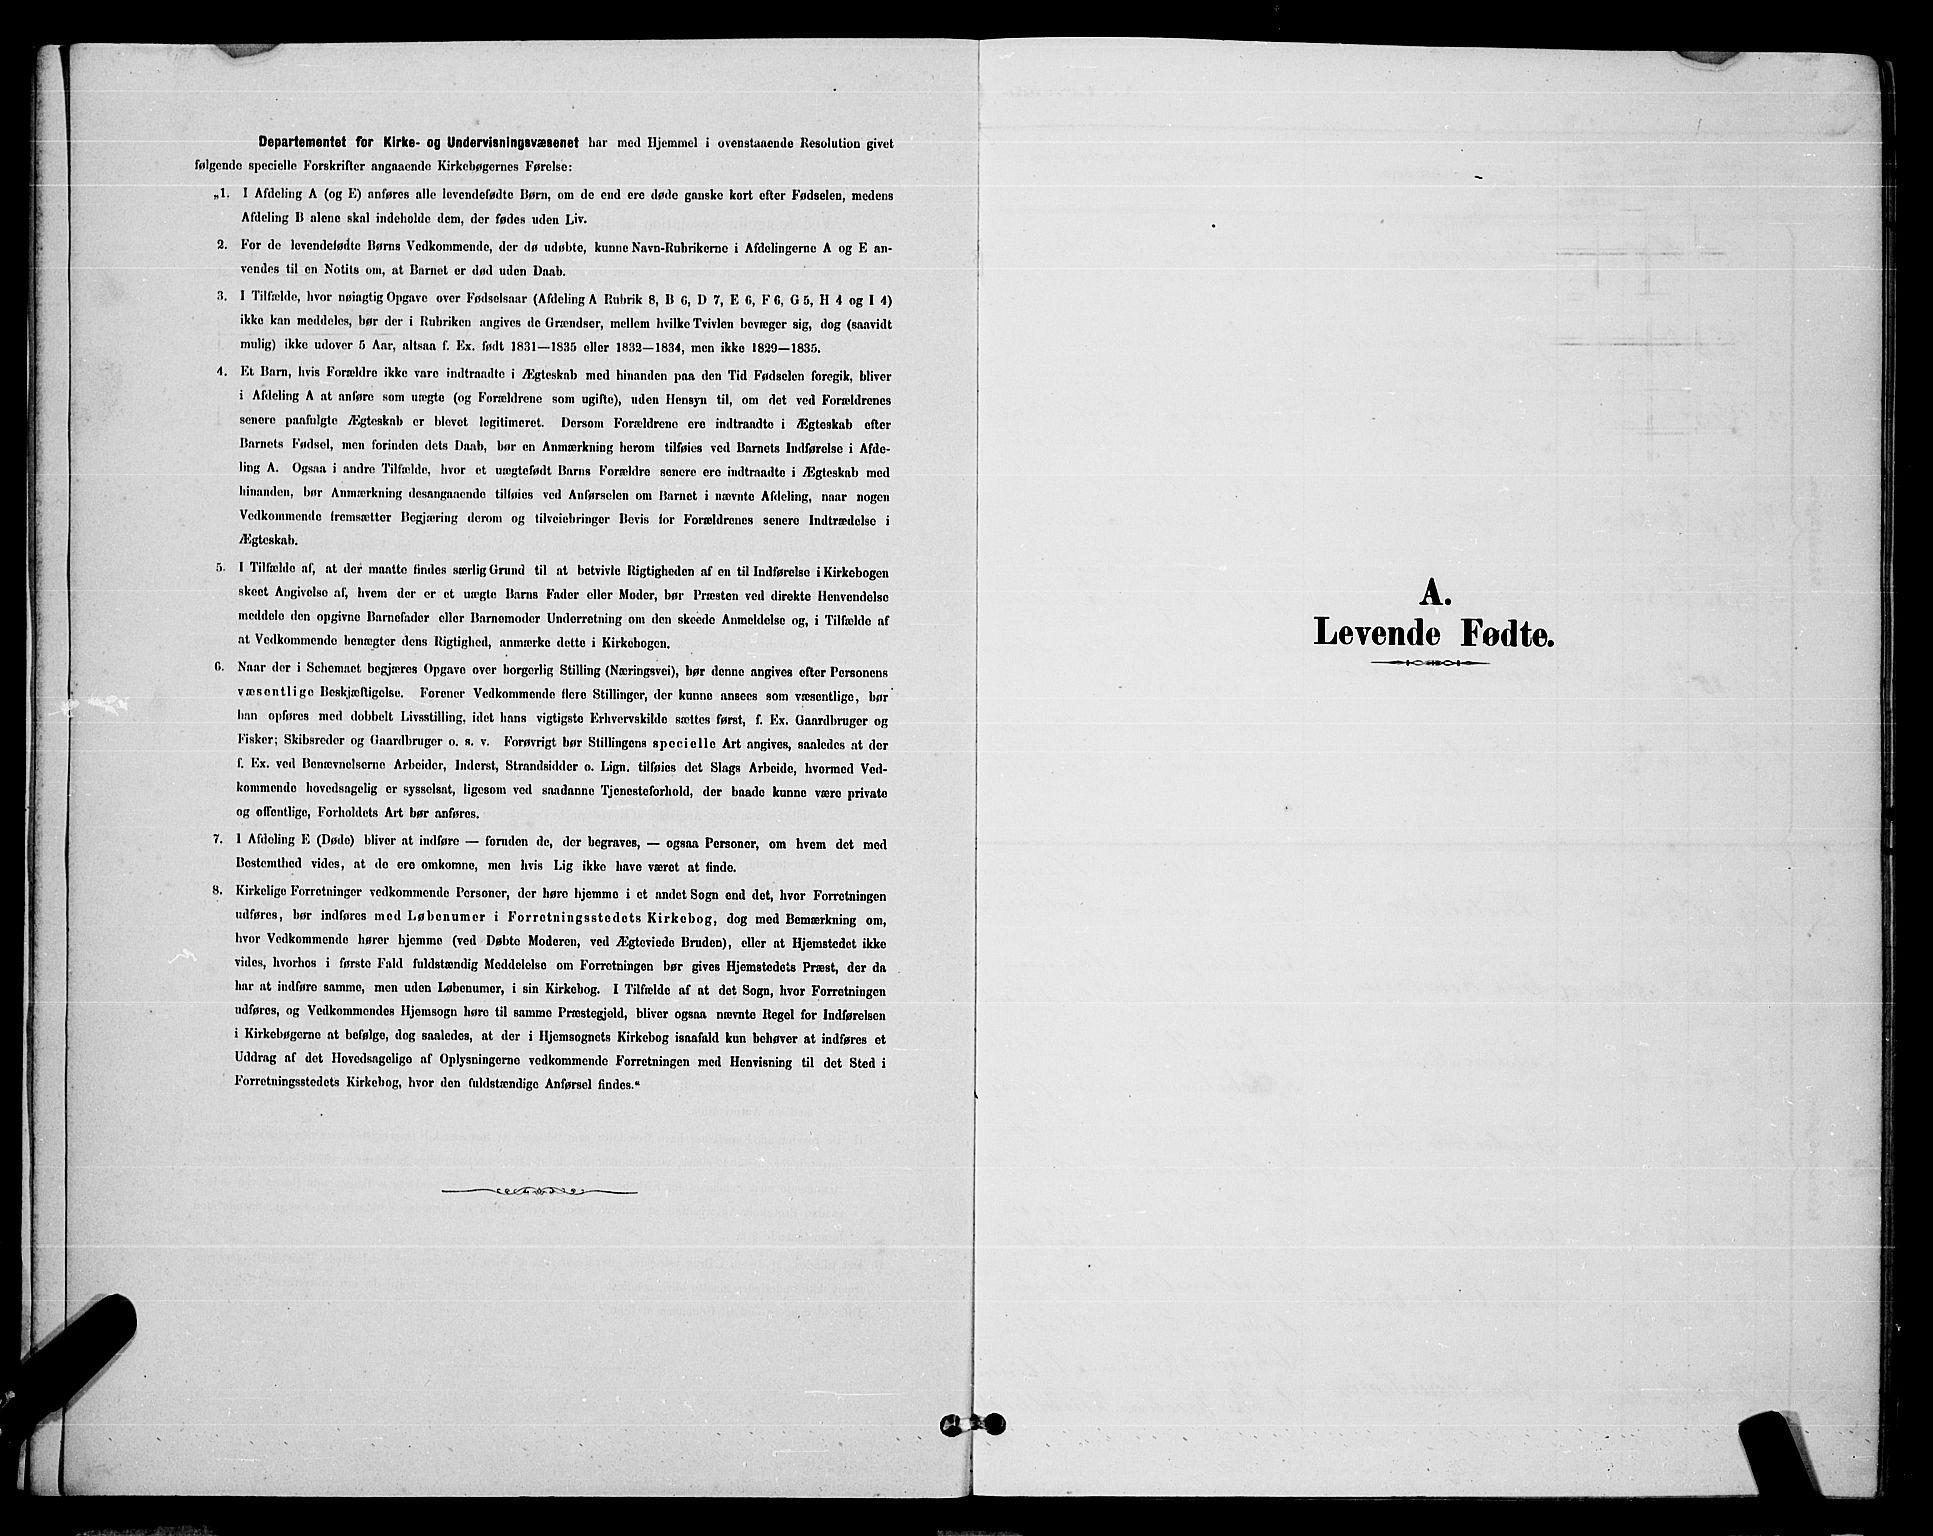 SAT, Ministerialprotokoller, klokkerbøker og fødselsregistre - Nordland, 863/L0914: Klokkerbok nr. 863C04, 1886-1897